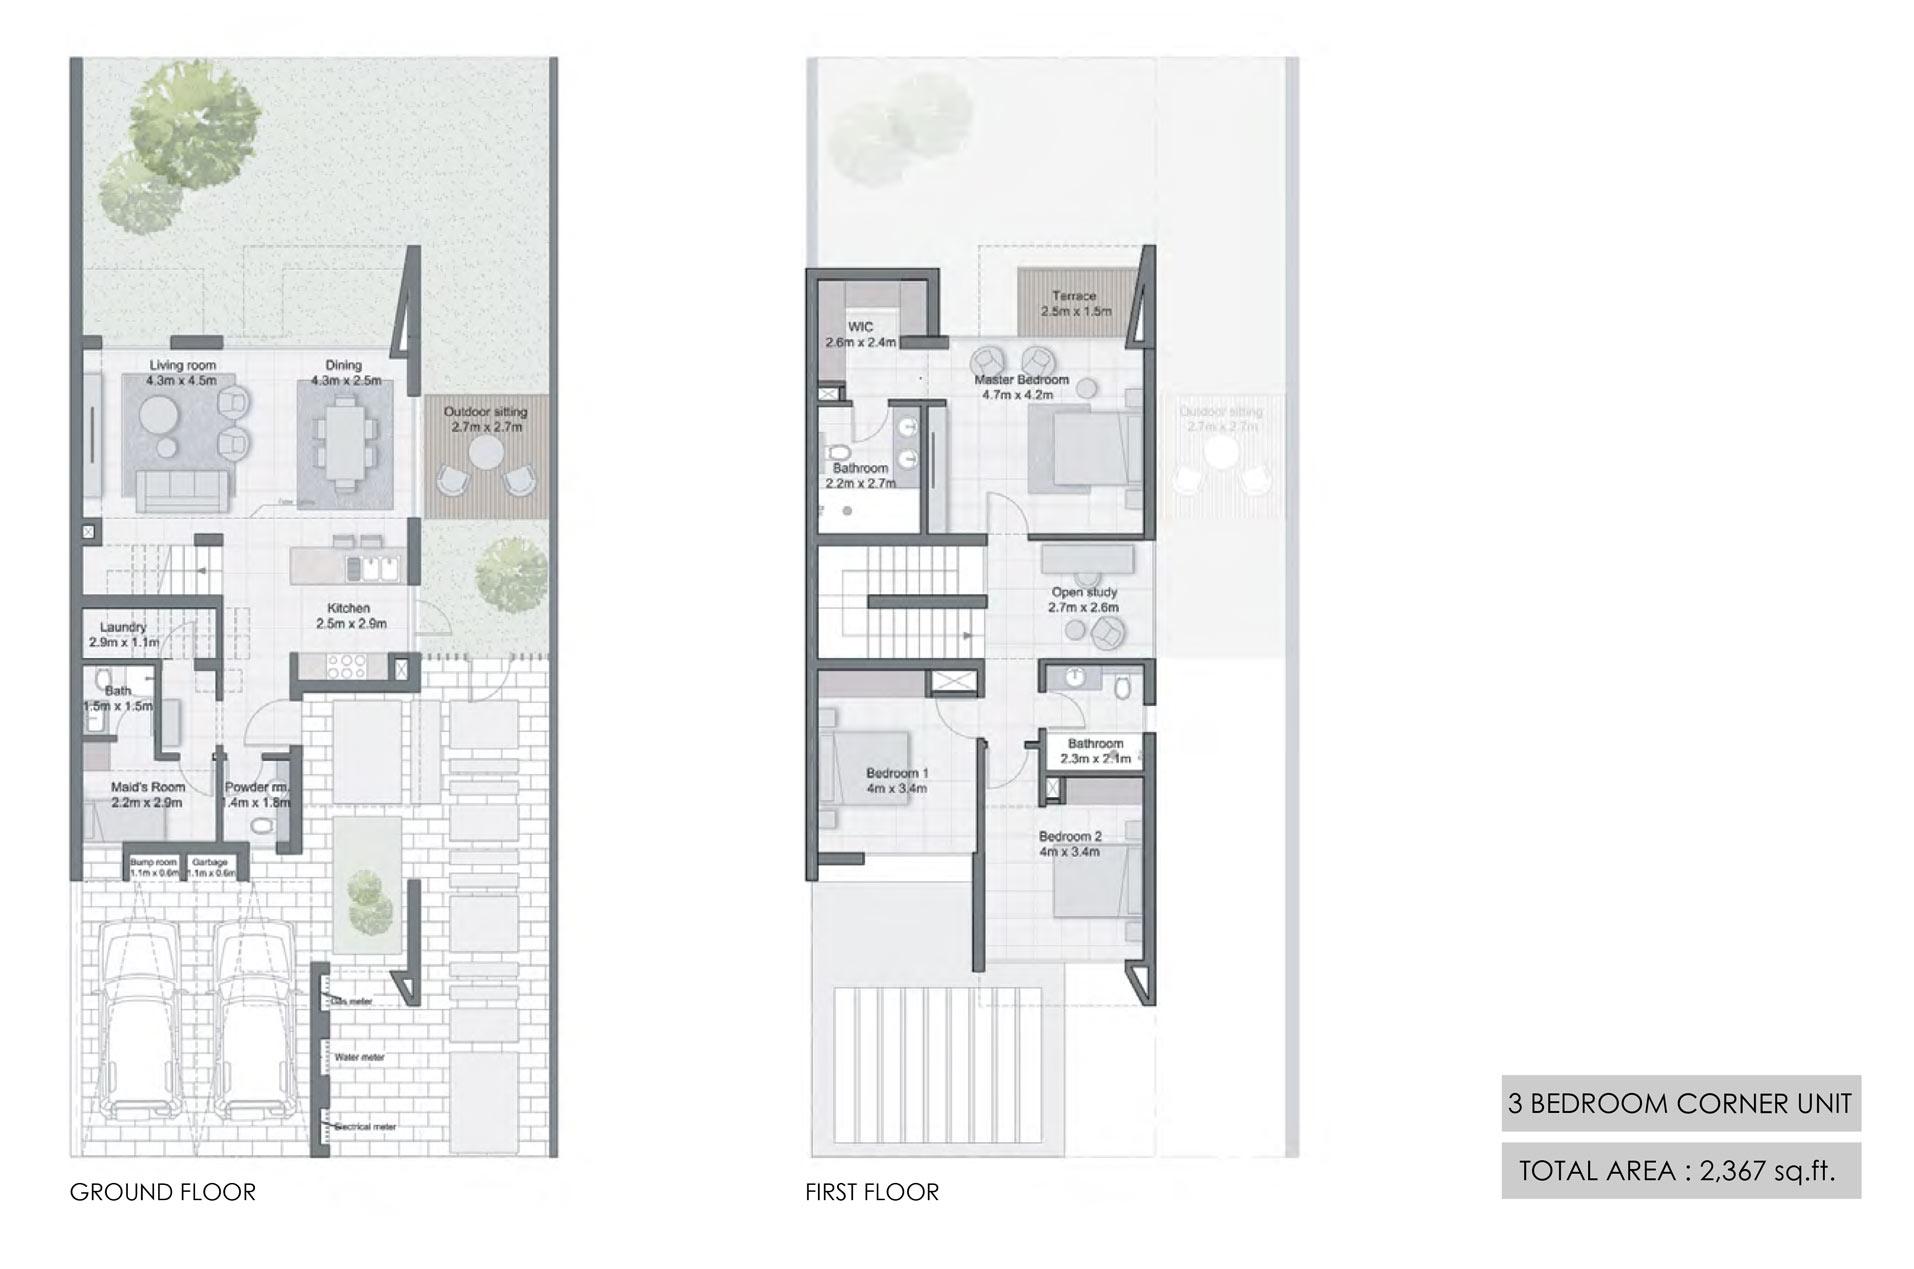 3 Bedroom Corner Unit Size 2367  sq. ft.